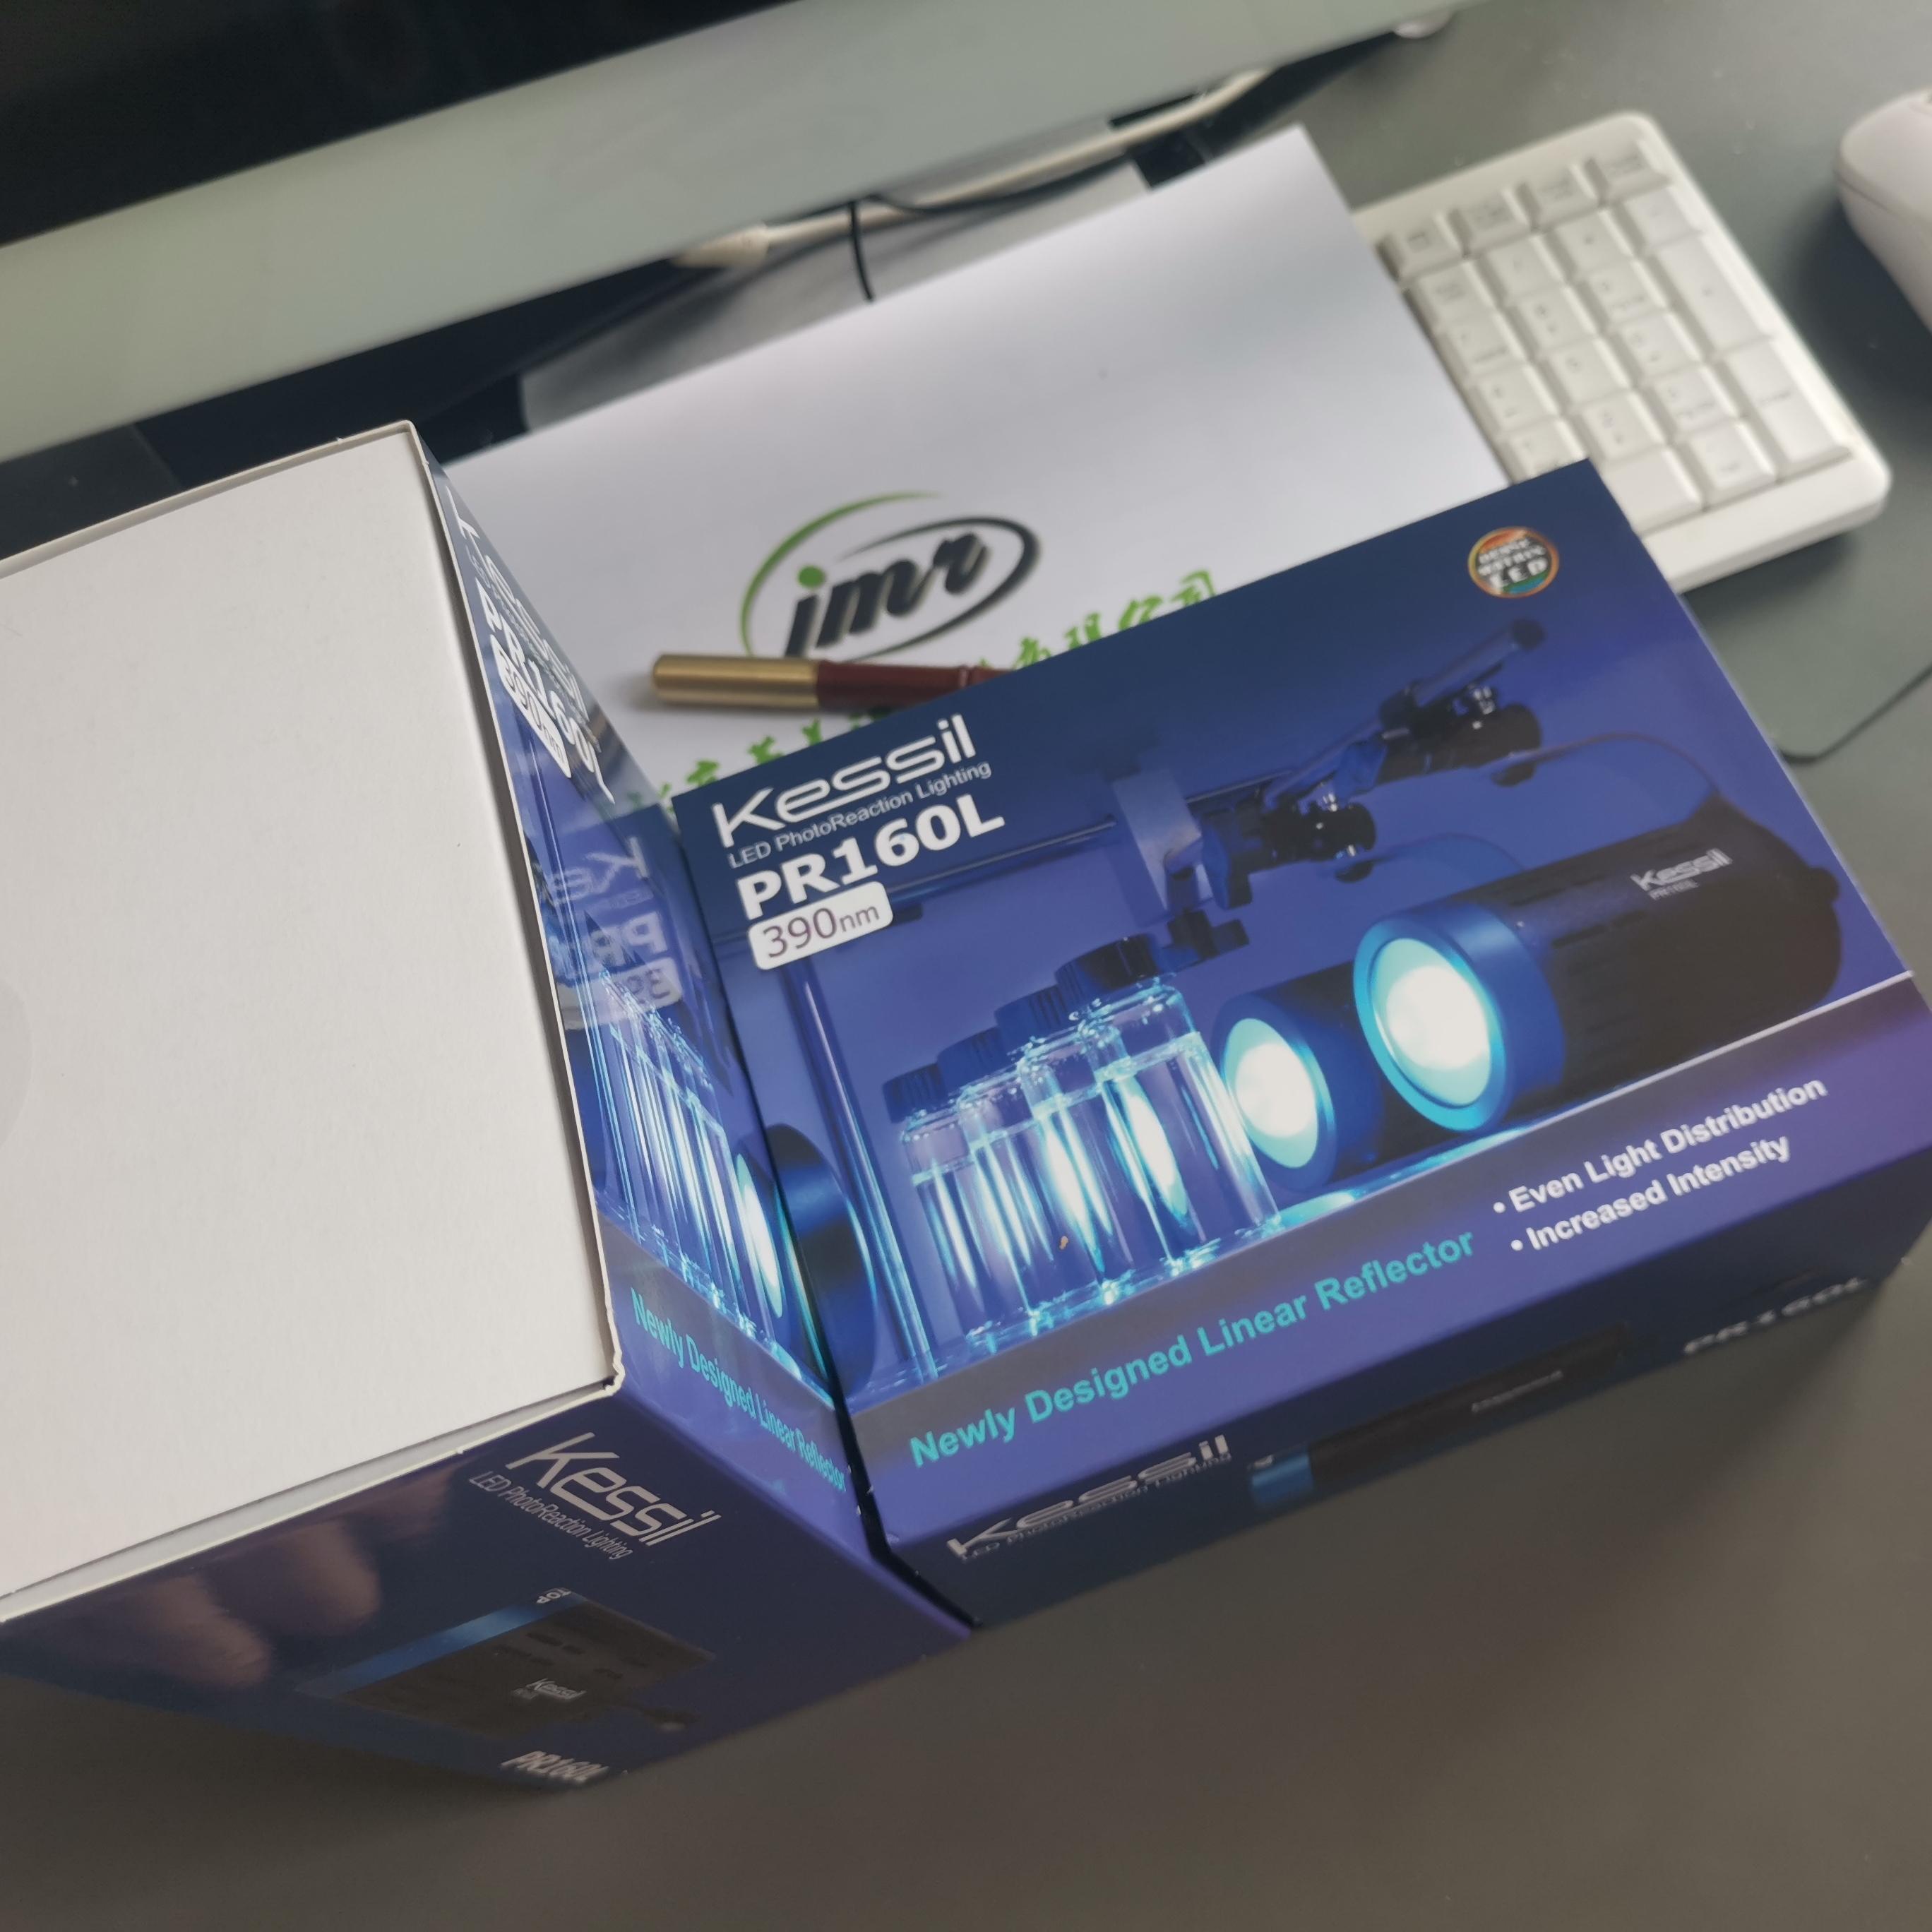 美國 kessil PR-160L 科研級LED光源/催化反應燈